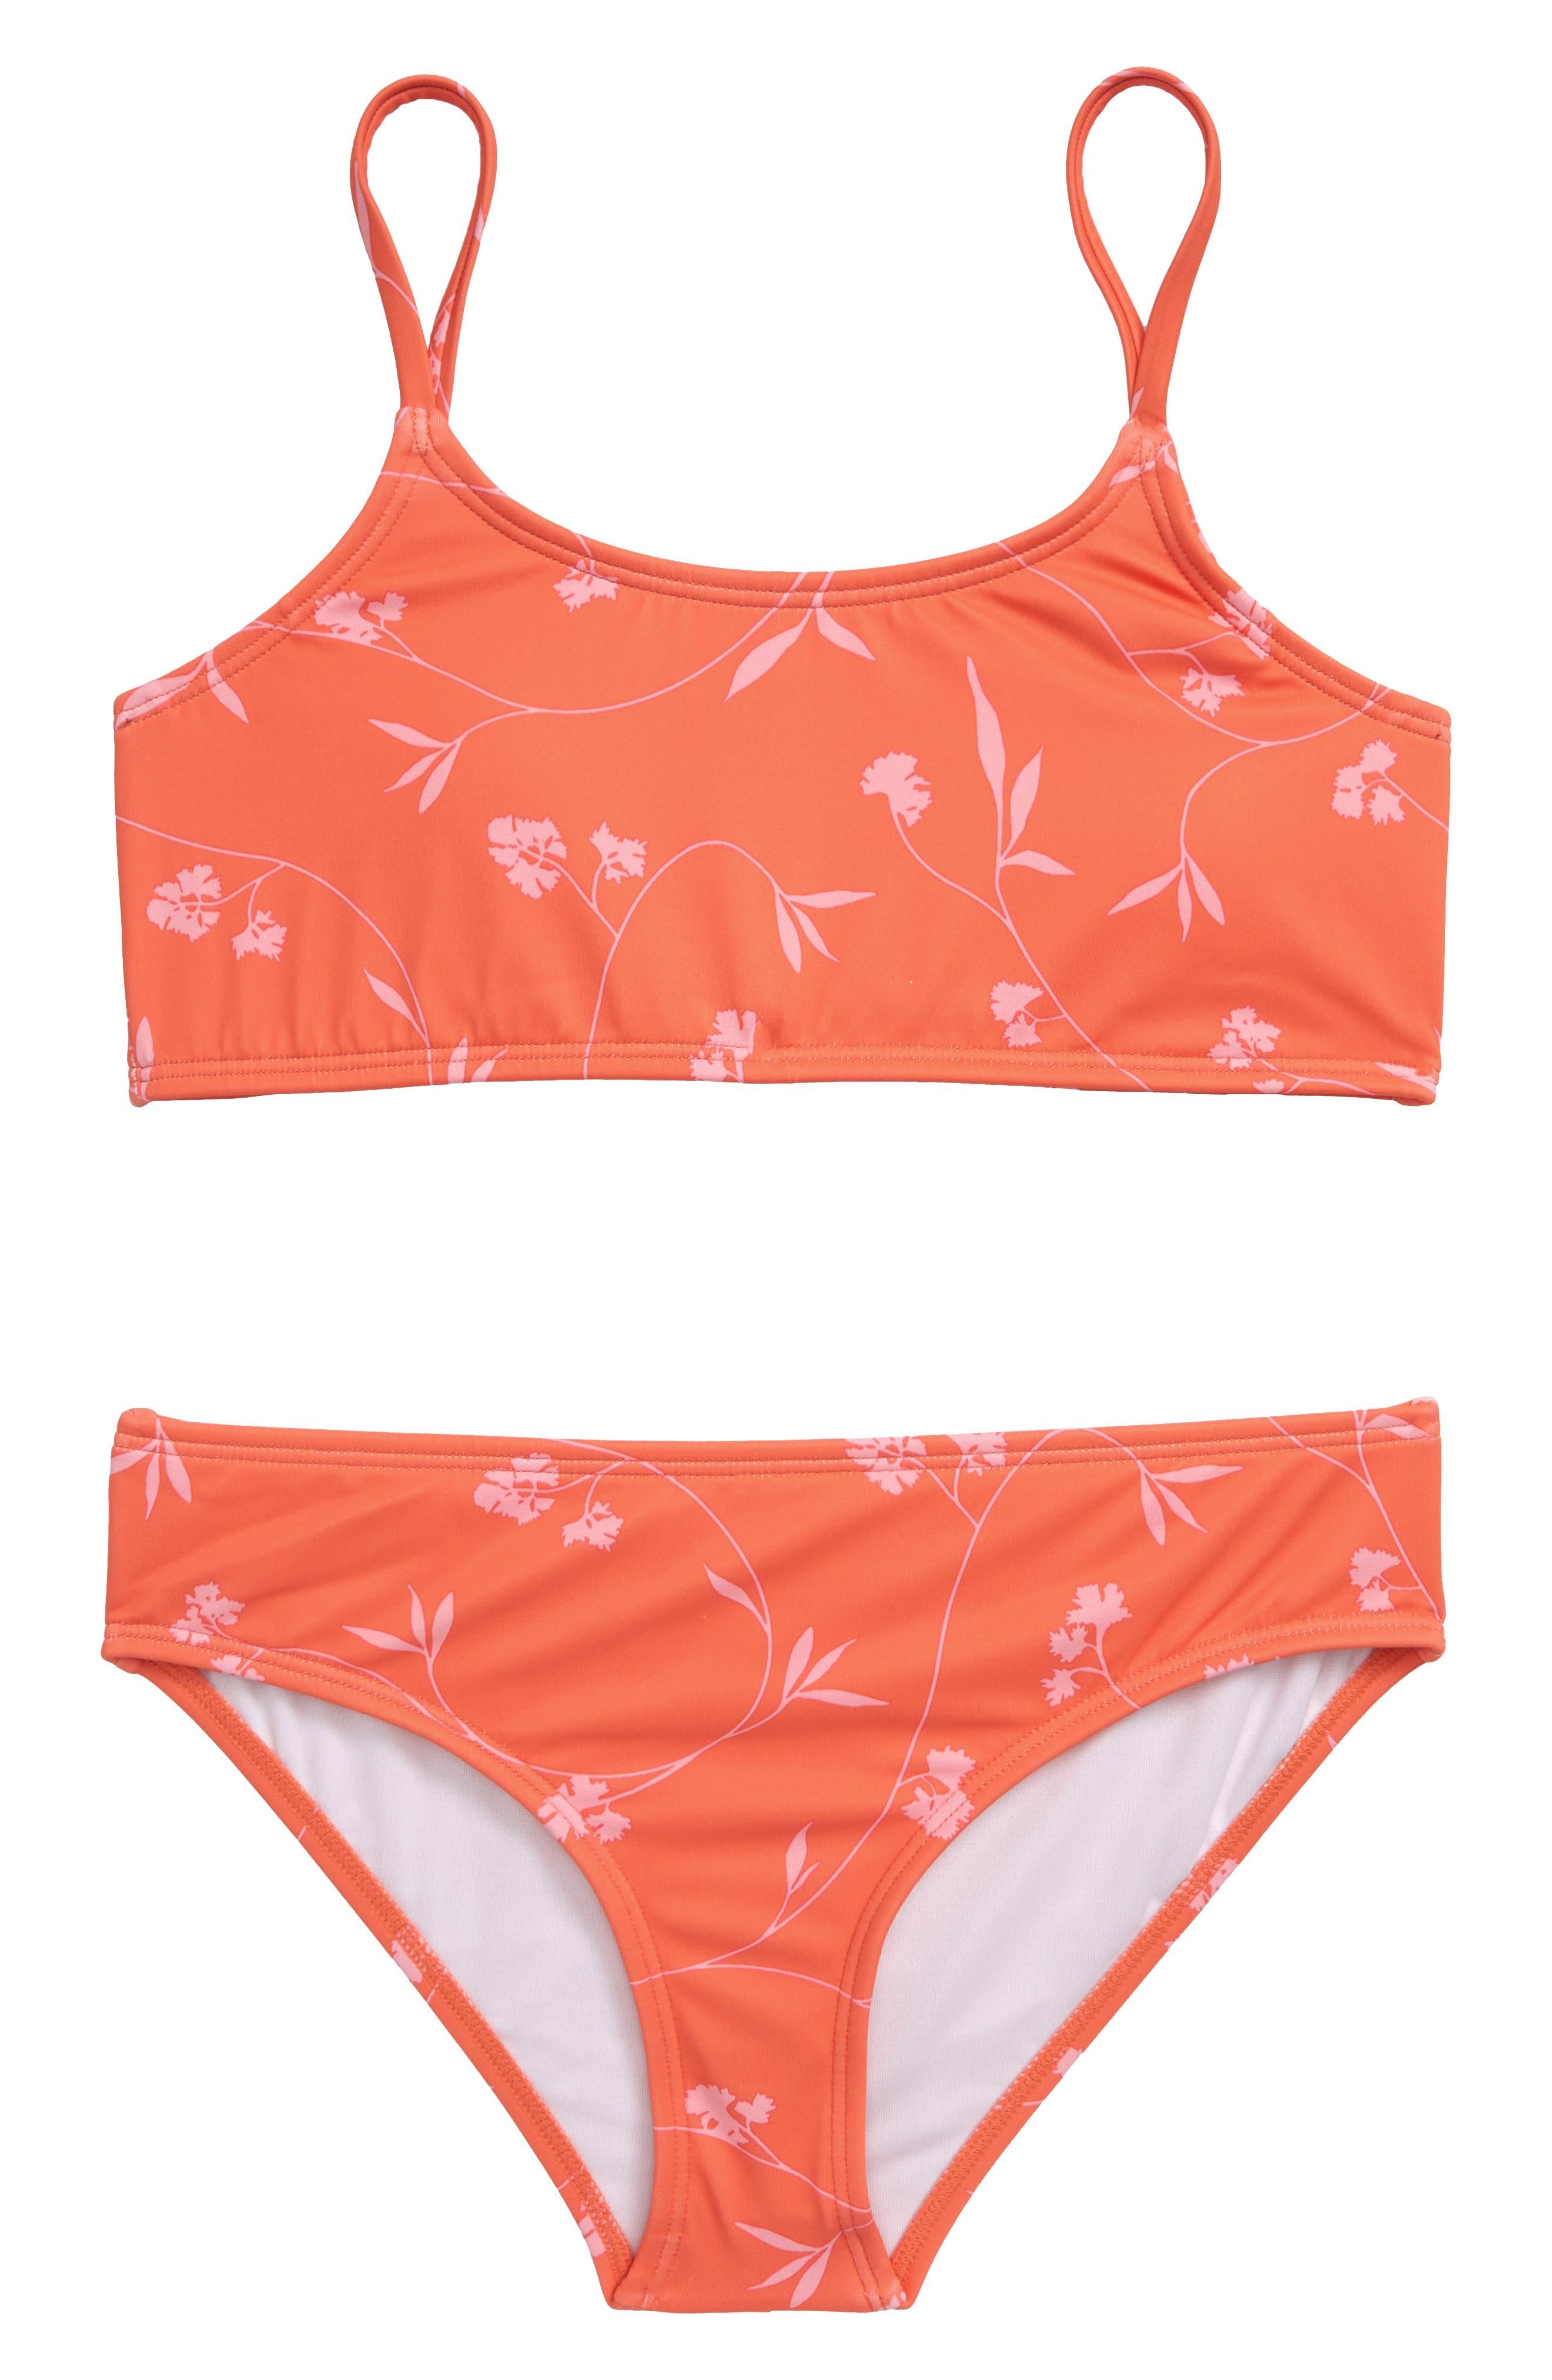 Girls Billabong Hanky Tie TwoPiece Swimsuit Size 10  Pink